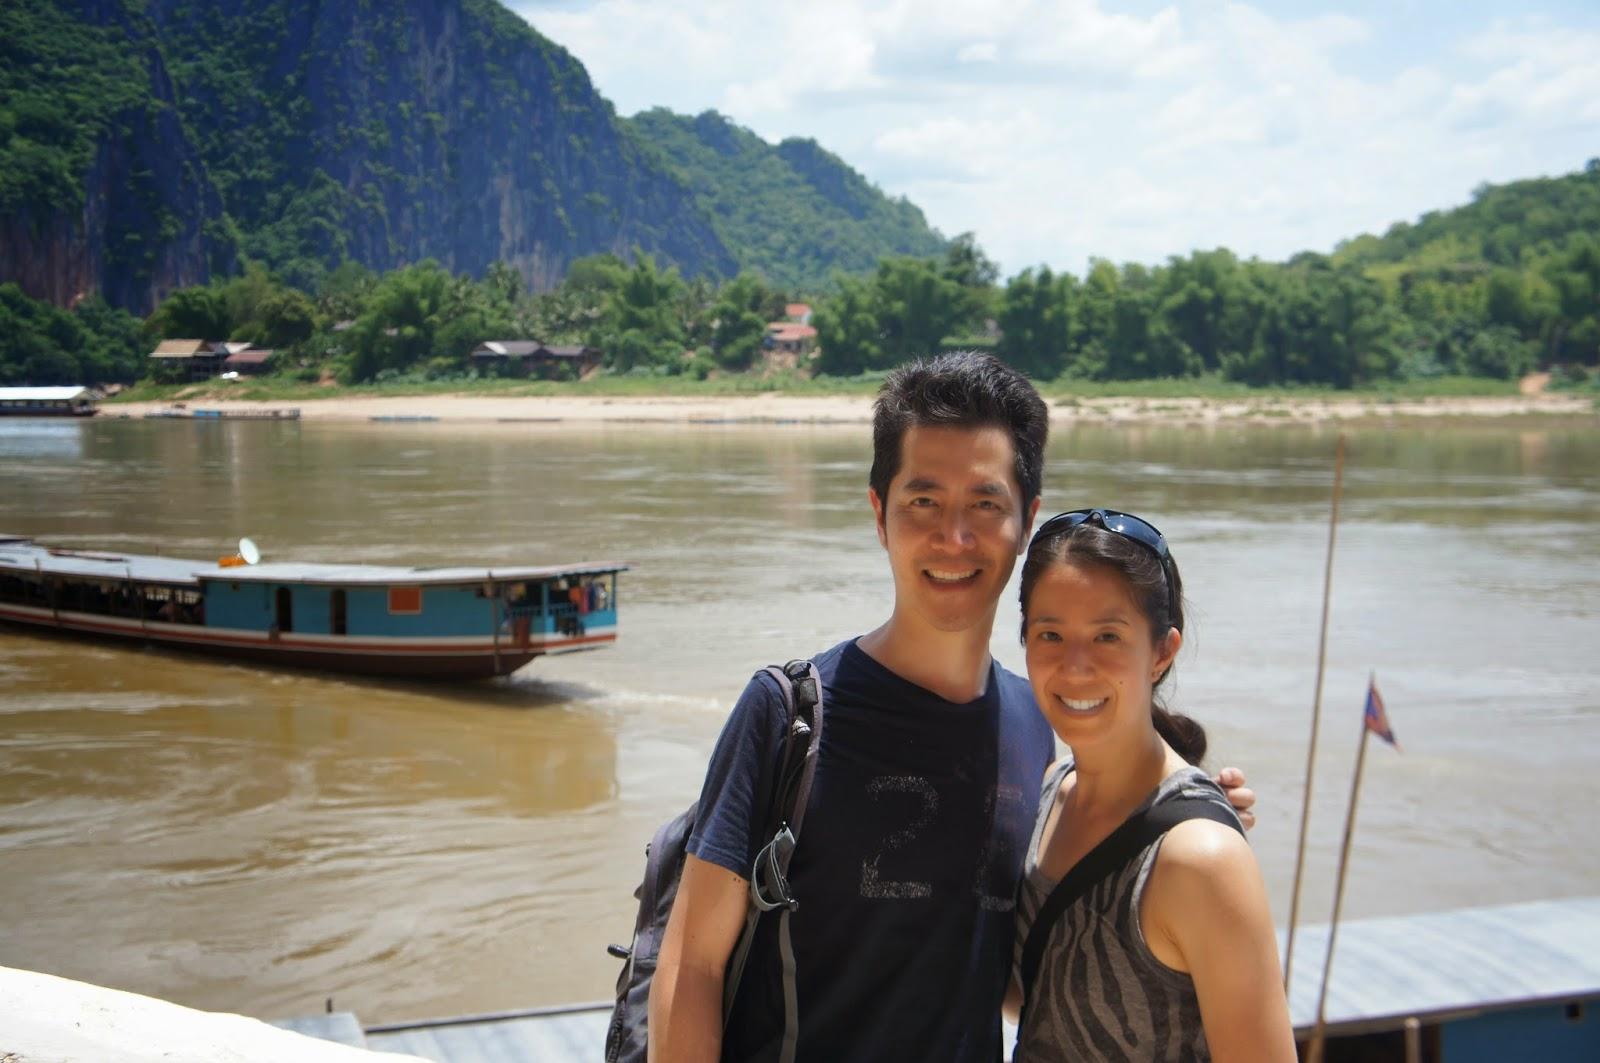 Luang Prabang - Photo op along the Mekong River